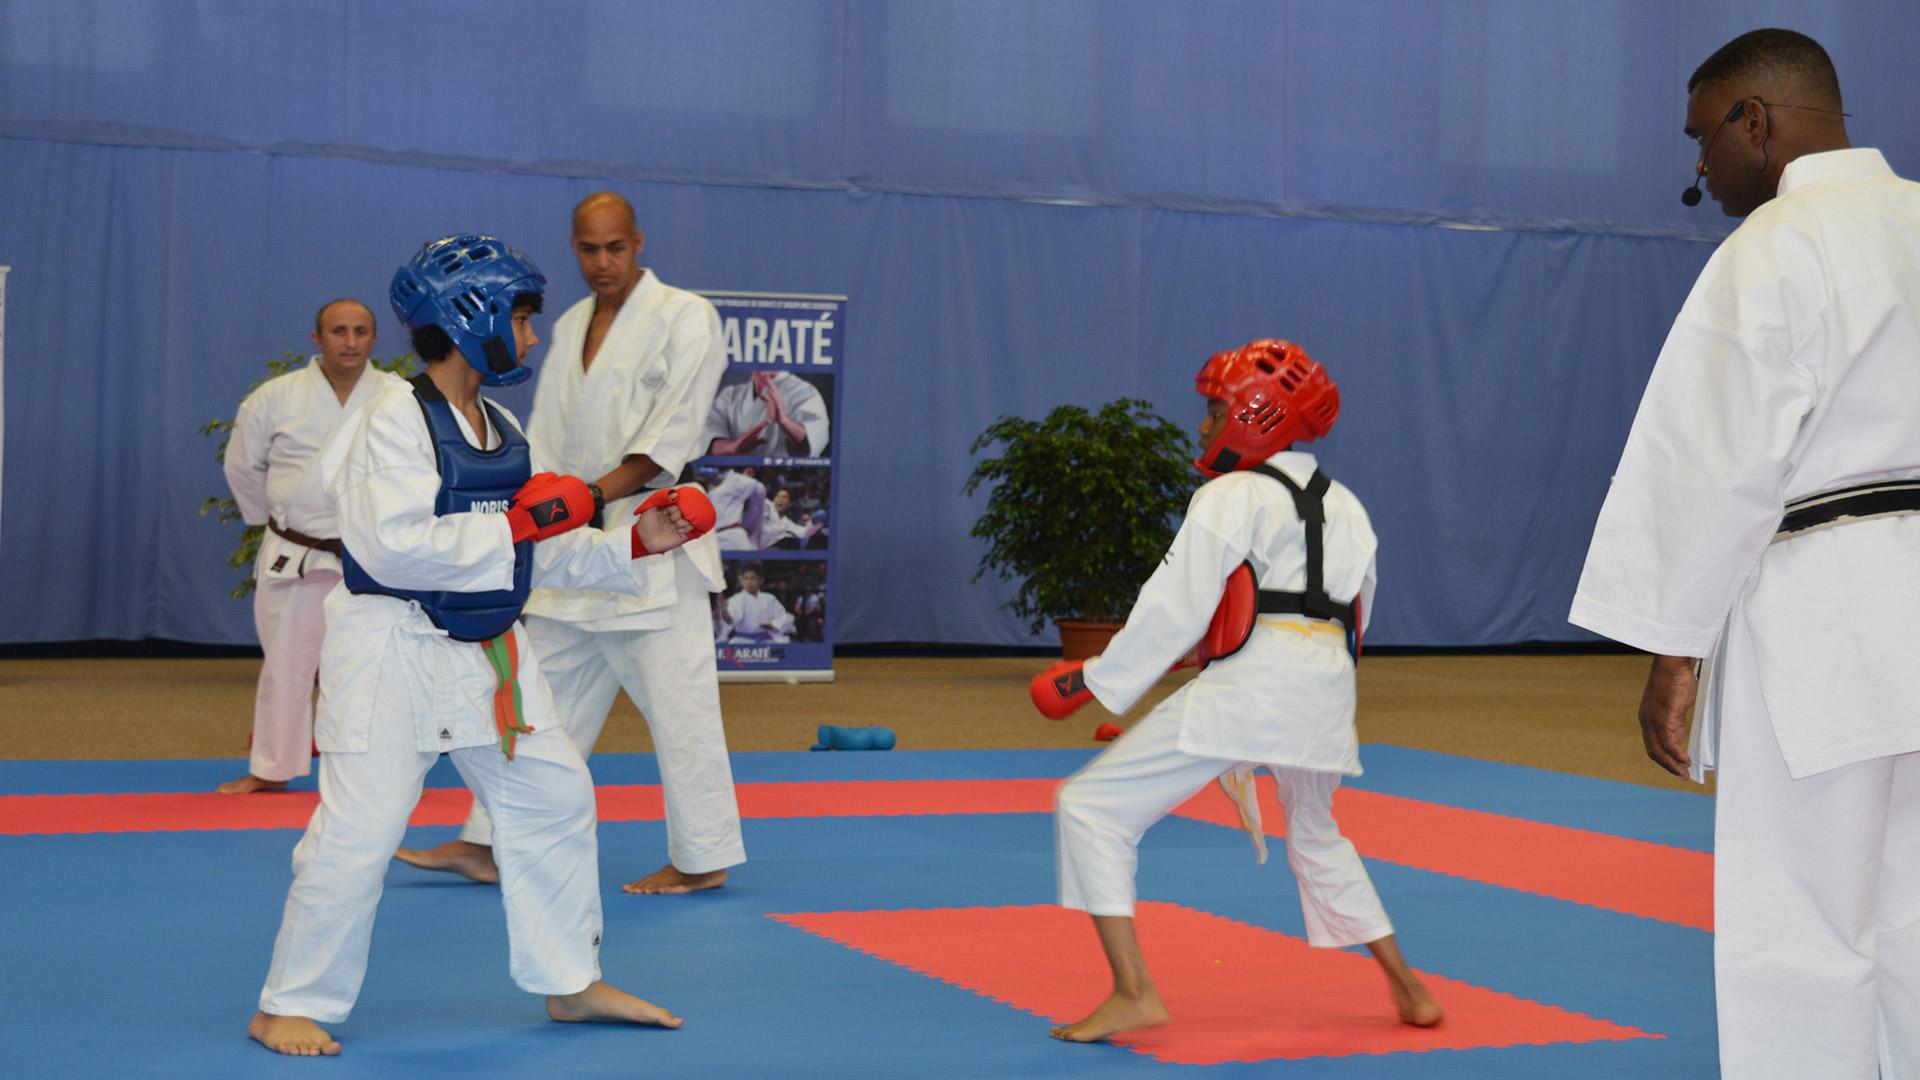 Karaté - Combat